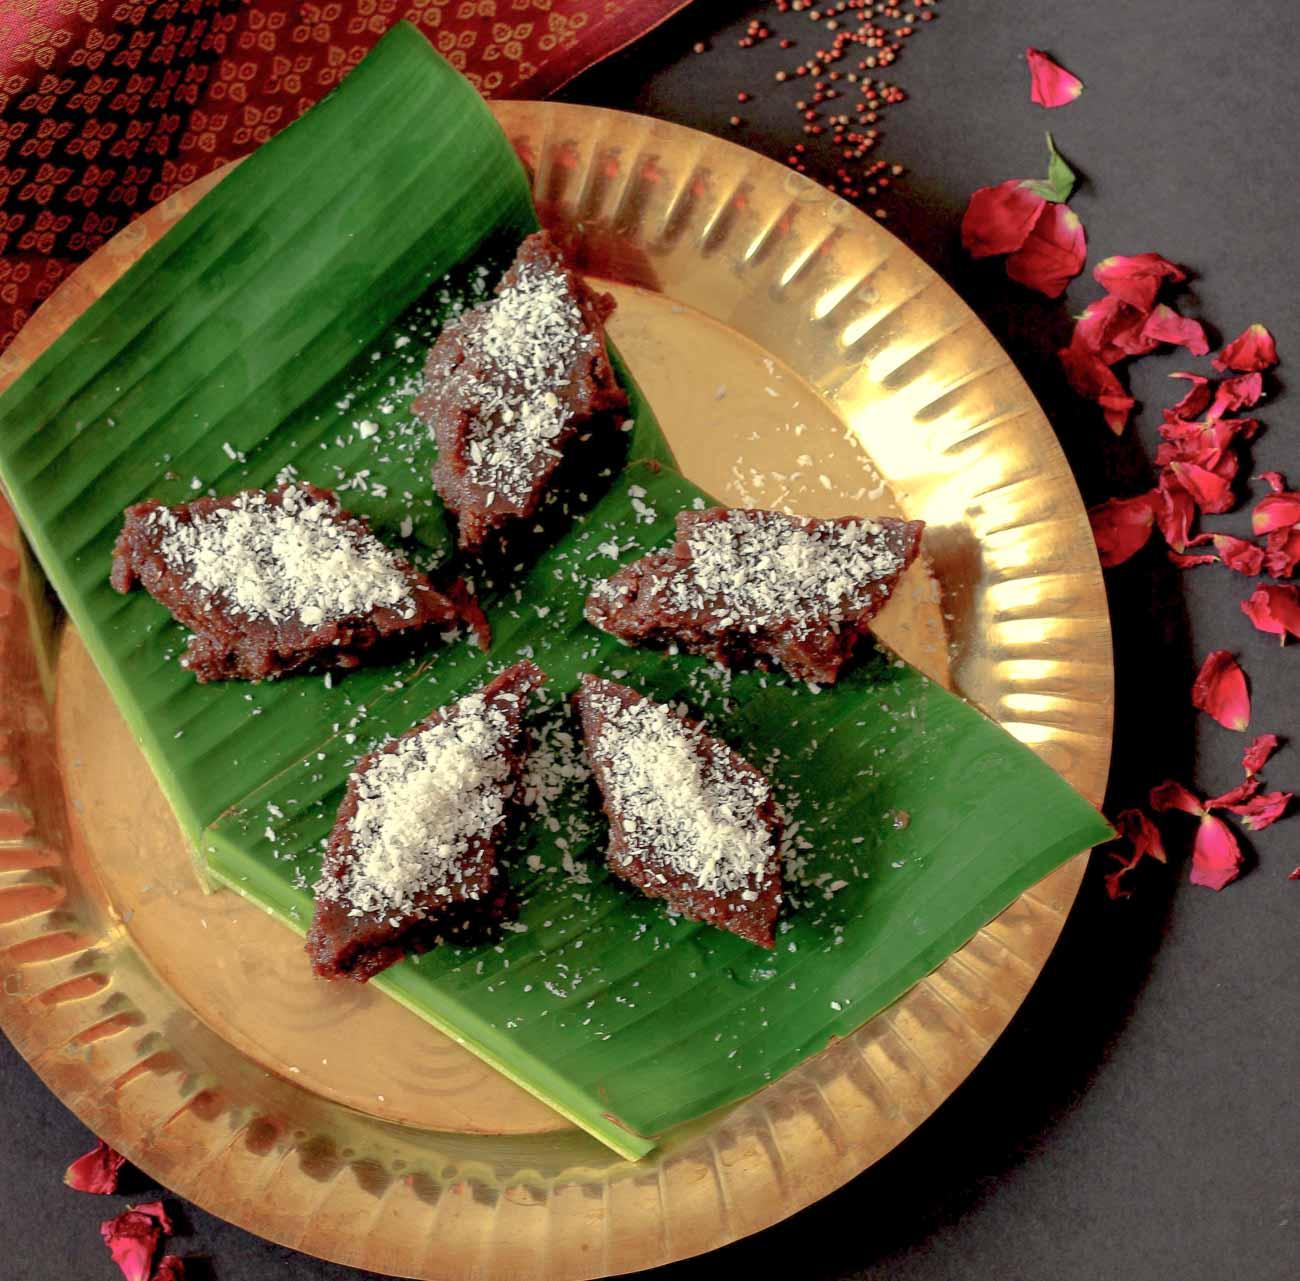 Ragi halbai recipe ragi halwa recipe by archanas kitchen ragi halbai recipe karnataka style ragi halwa recipe forumfinder Choice Image